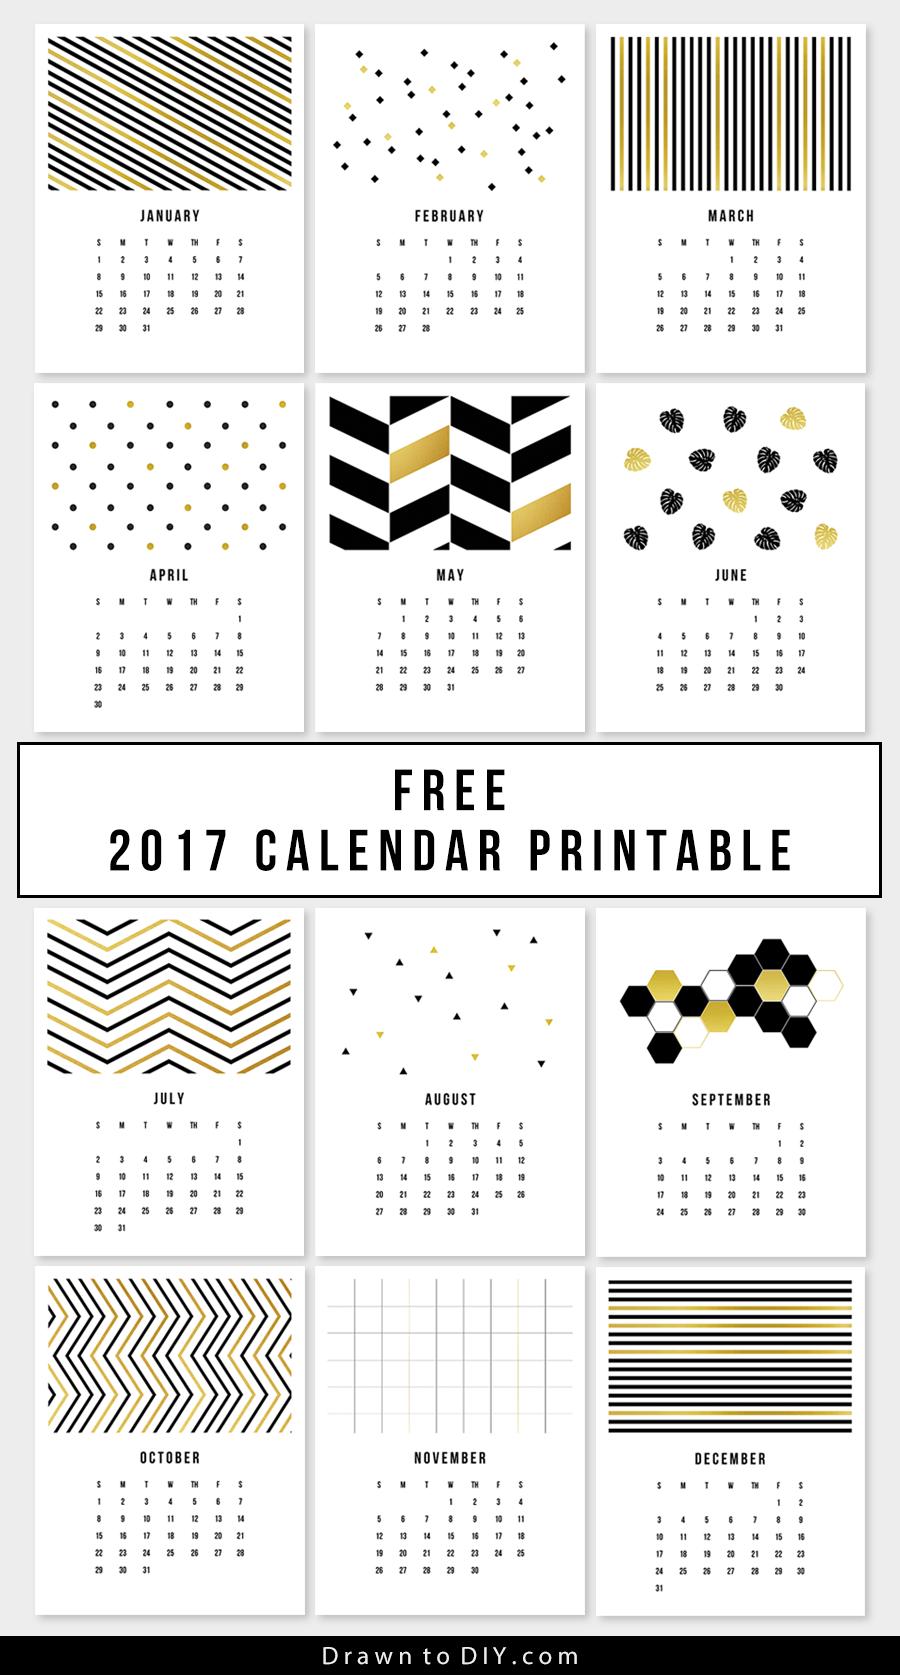 Drawn calendar printable #7